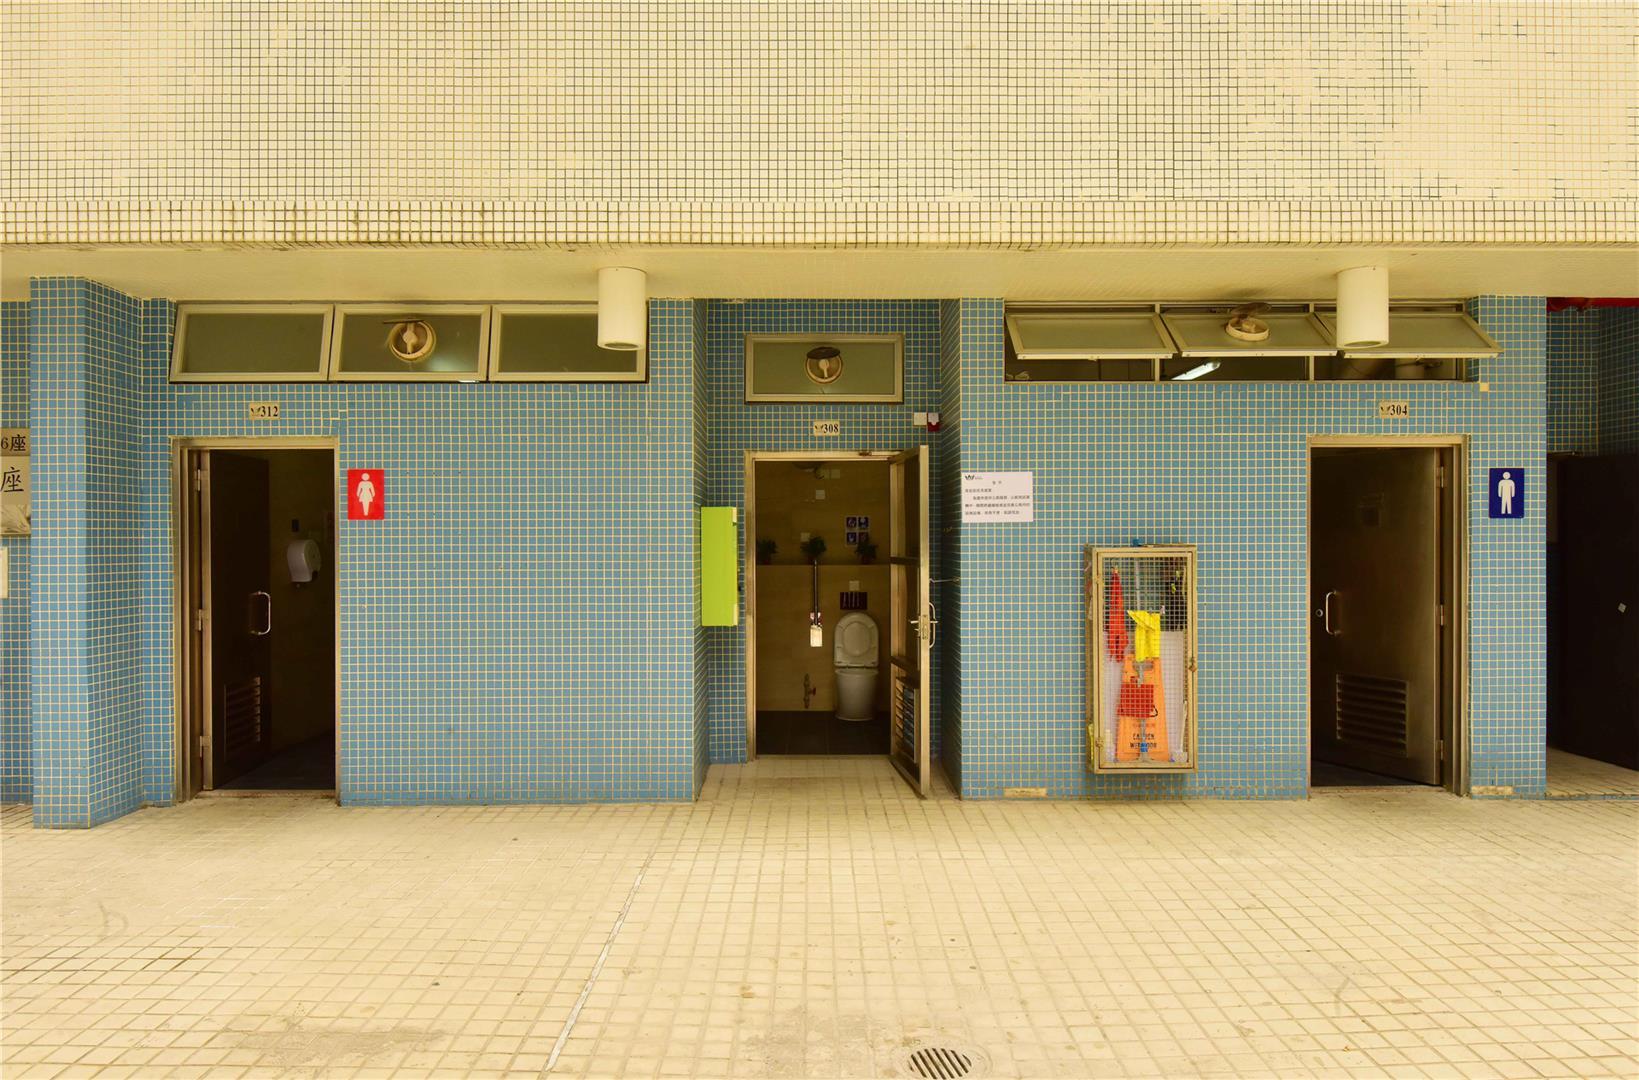 C13 Public toilet at Edifício Ip Heng in Seac Pai Van in Coloane